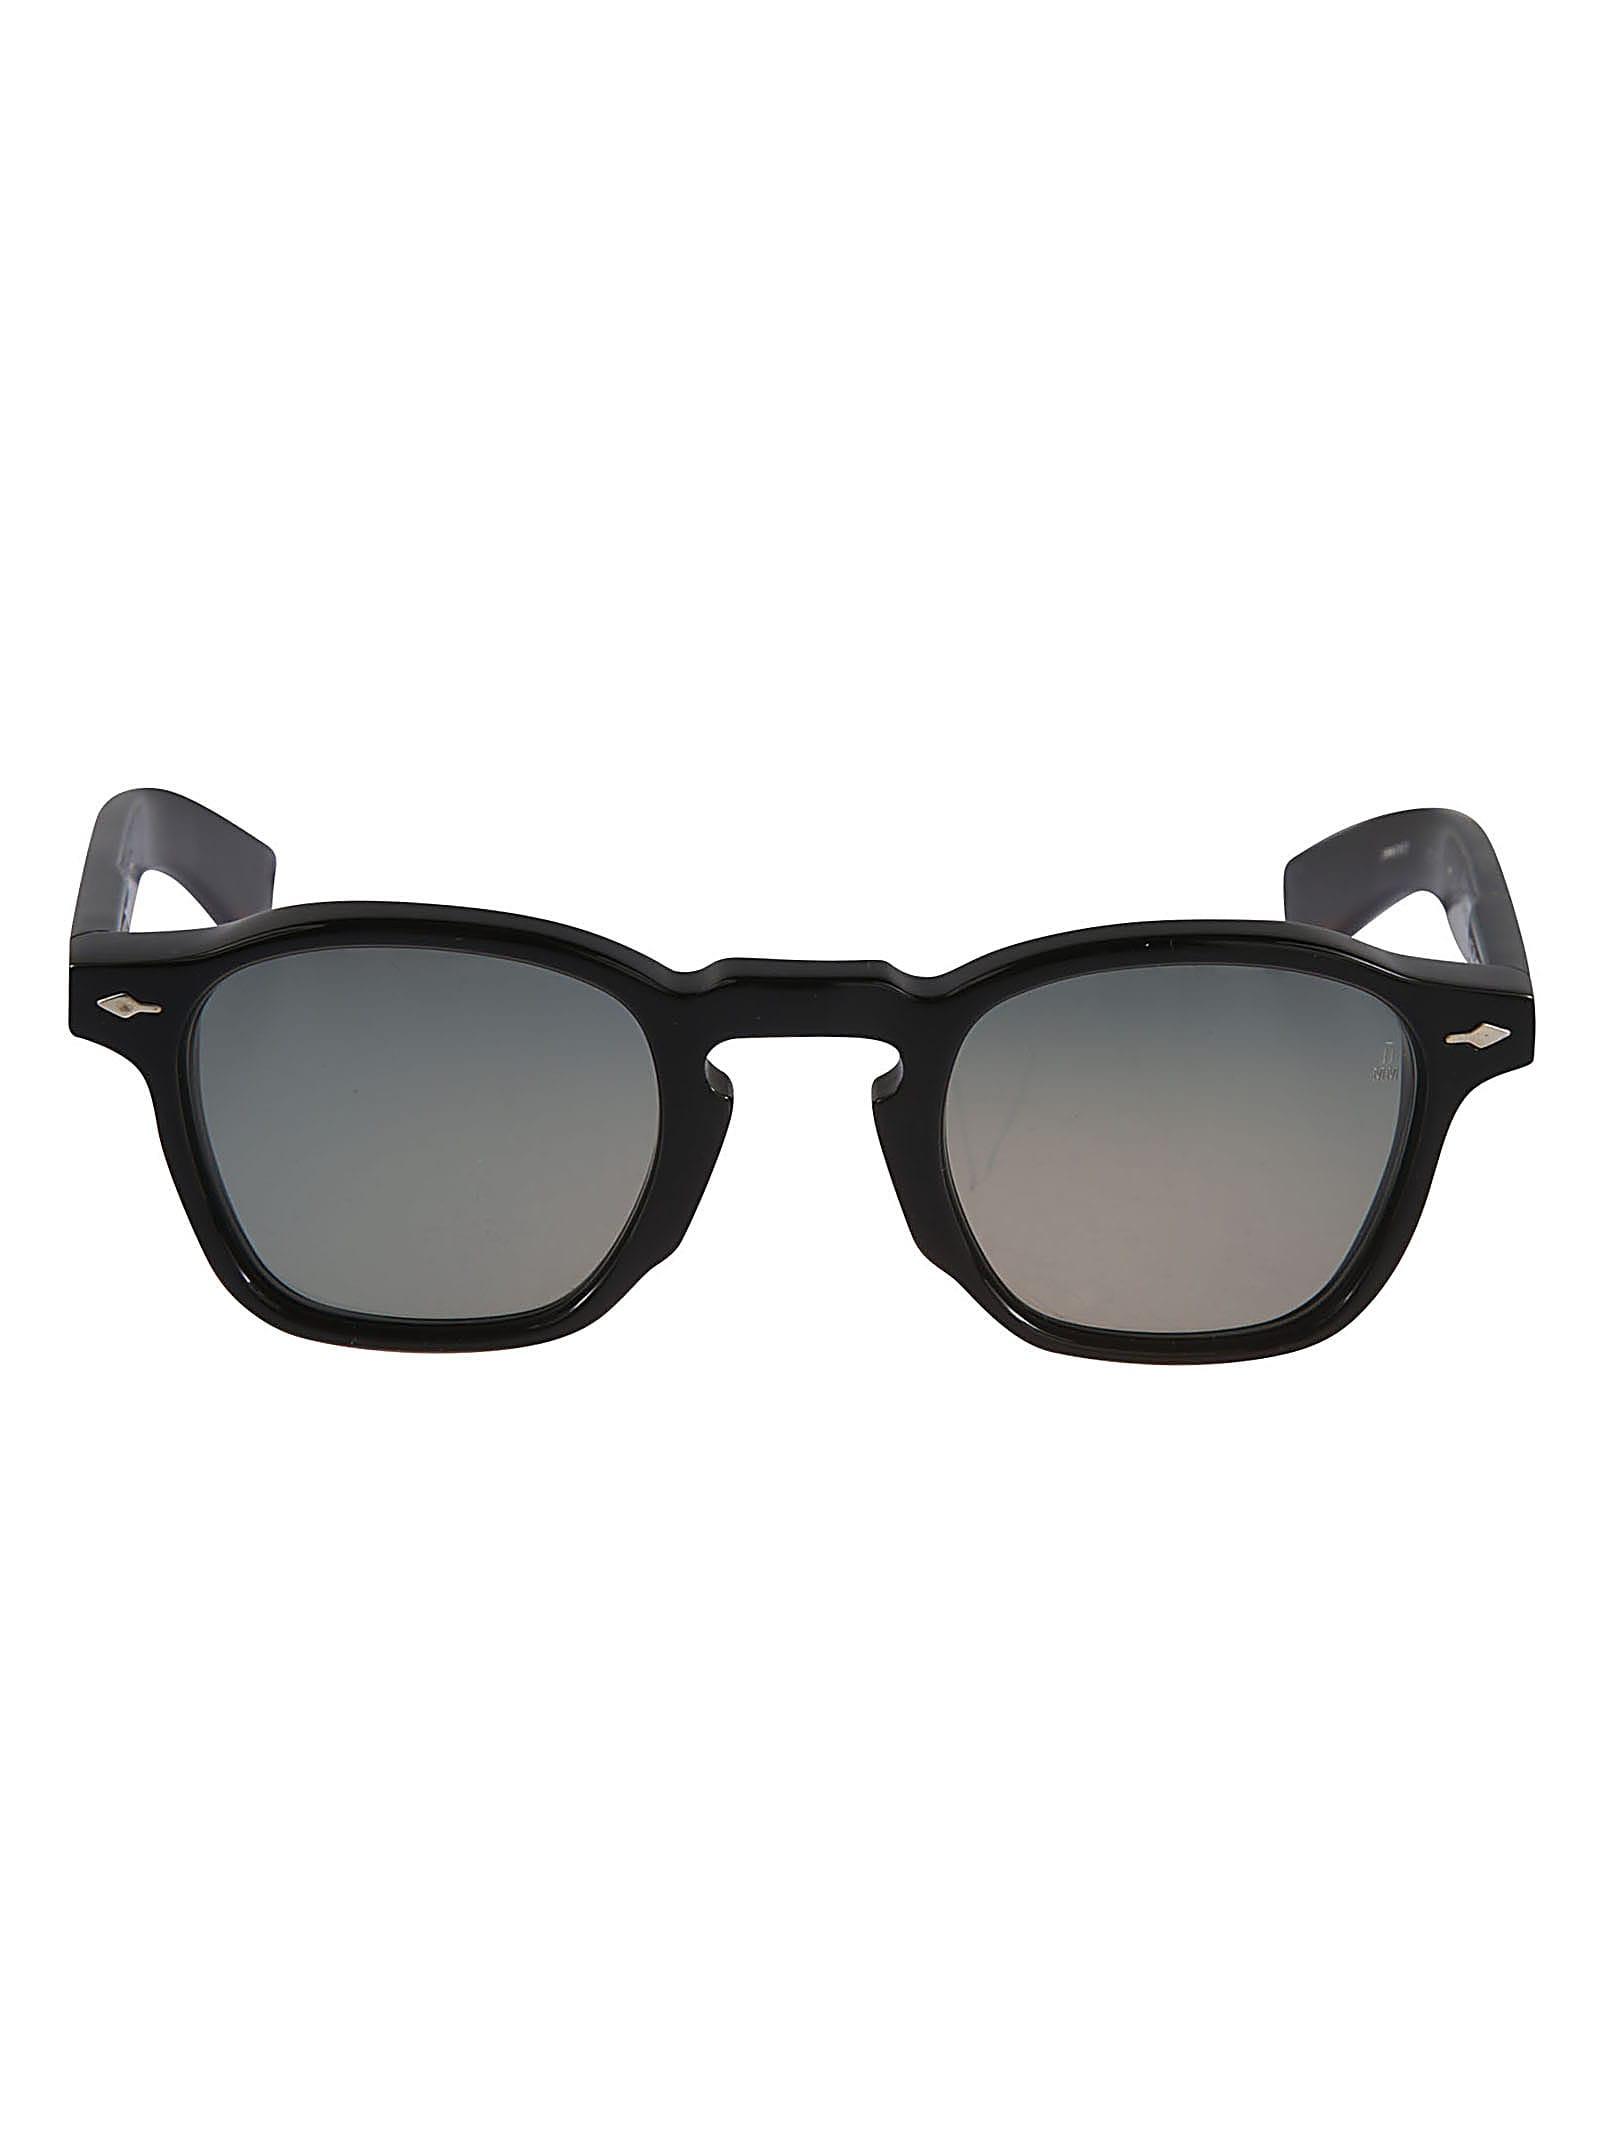 Logo Detail Curved Square Frame Sunglasses